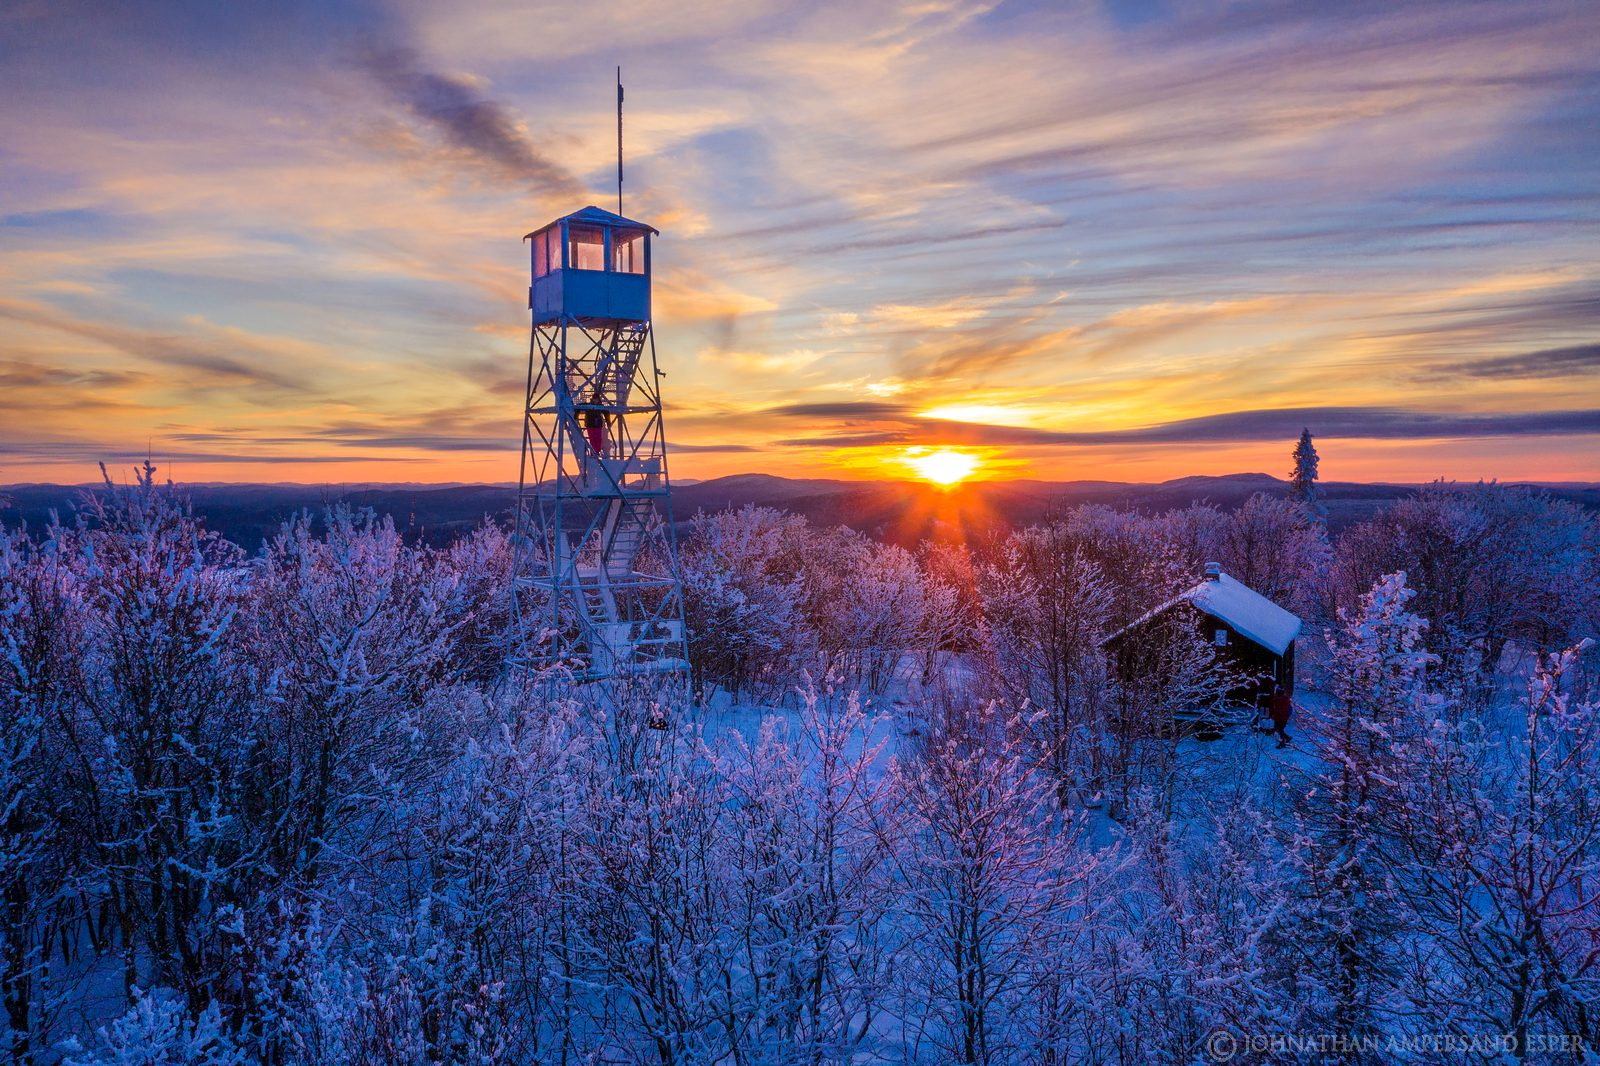 Mt. Arab,Mt Arab,Mt Arab firetower,Mt. Arab firetower,firetower,Firetower,Tupper Lake,winter,drone,2021,alpenglow,sunset